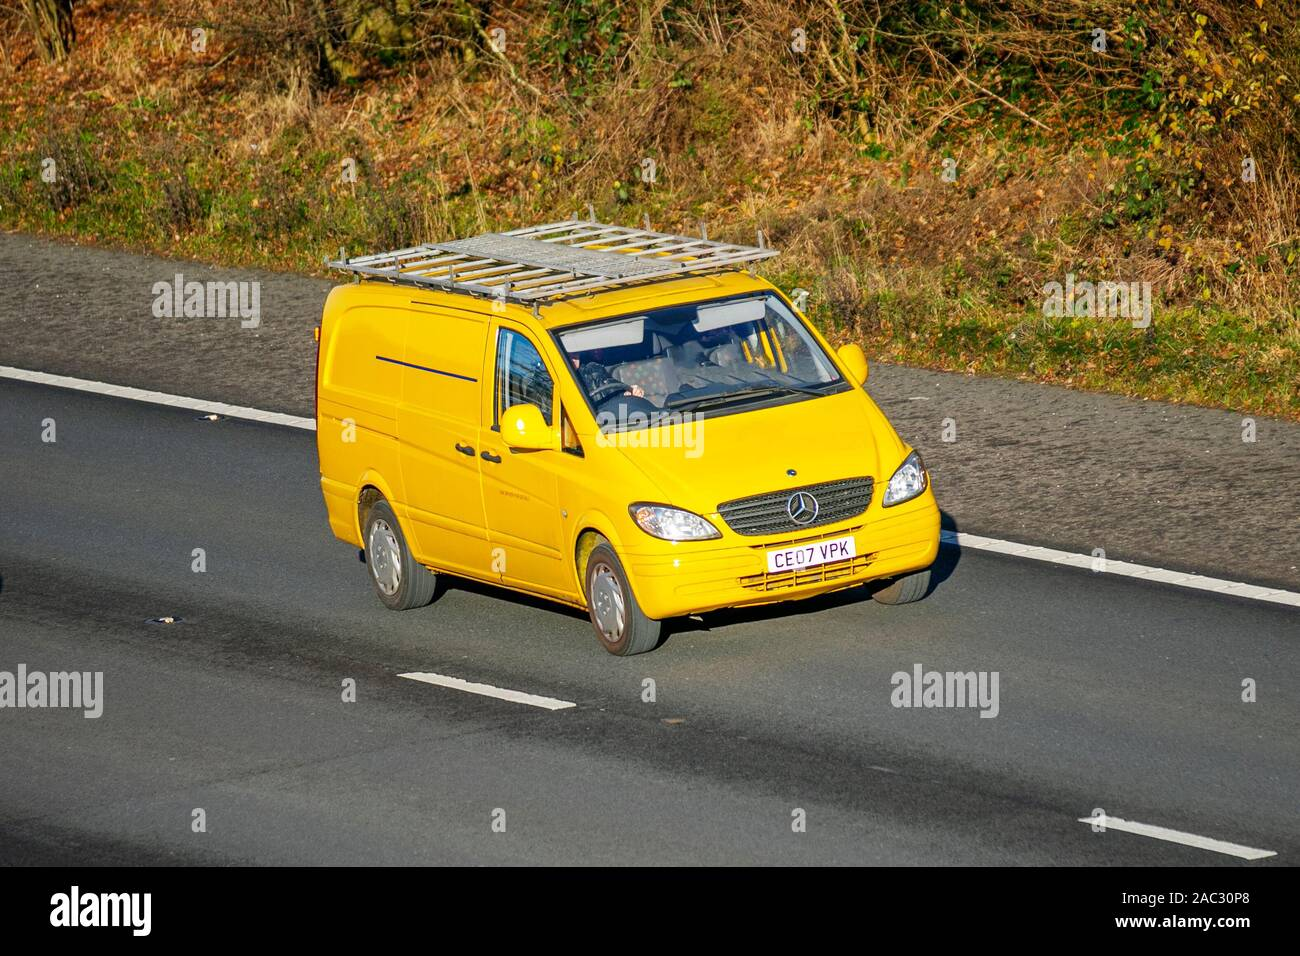 super popular cele mai bune preturi prezentarea Mercedes Benz Van Stock Photos & Mercedes Benz Van Stock Images ...